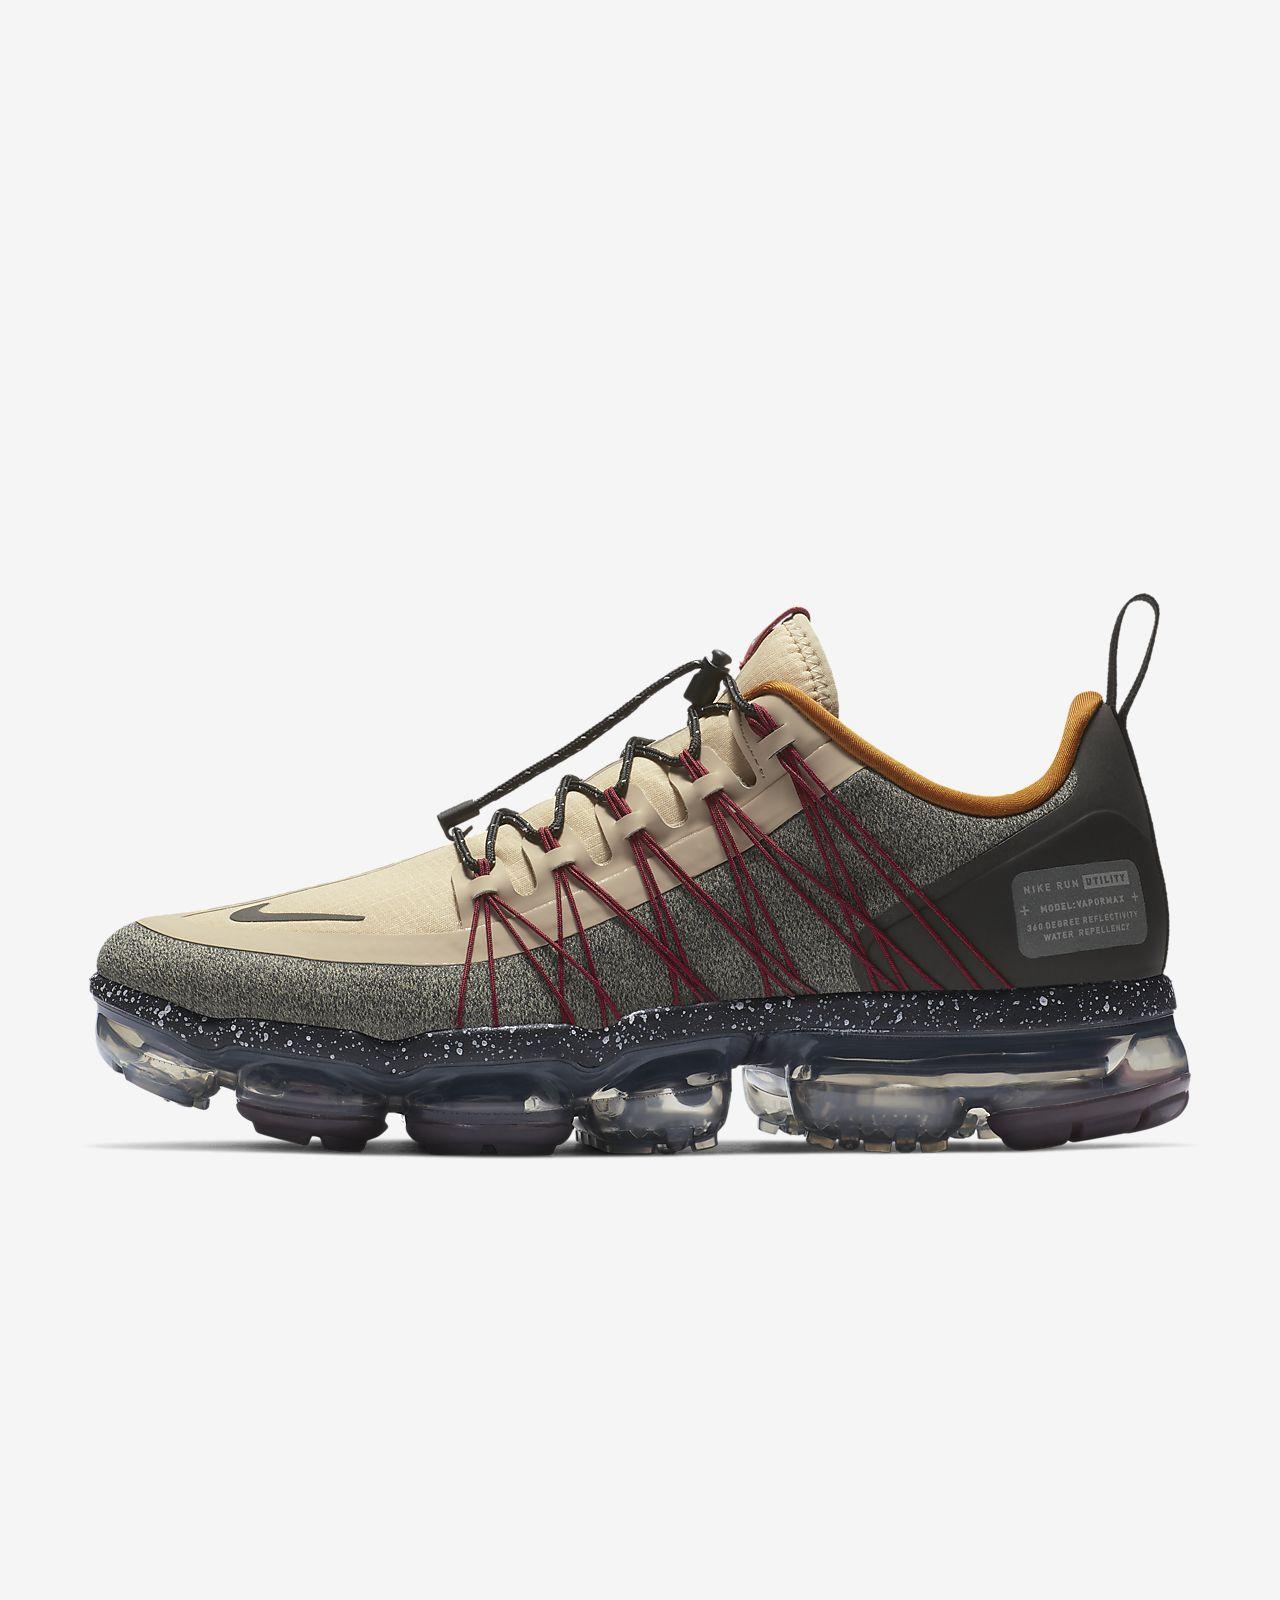 bb79013d83ca5 Chaussure Nike Air VaporMax Utility pour Homme. Nike.com CA